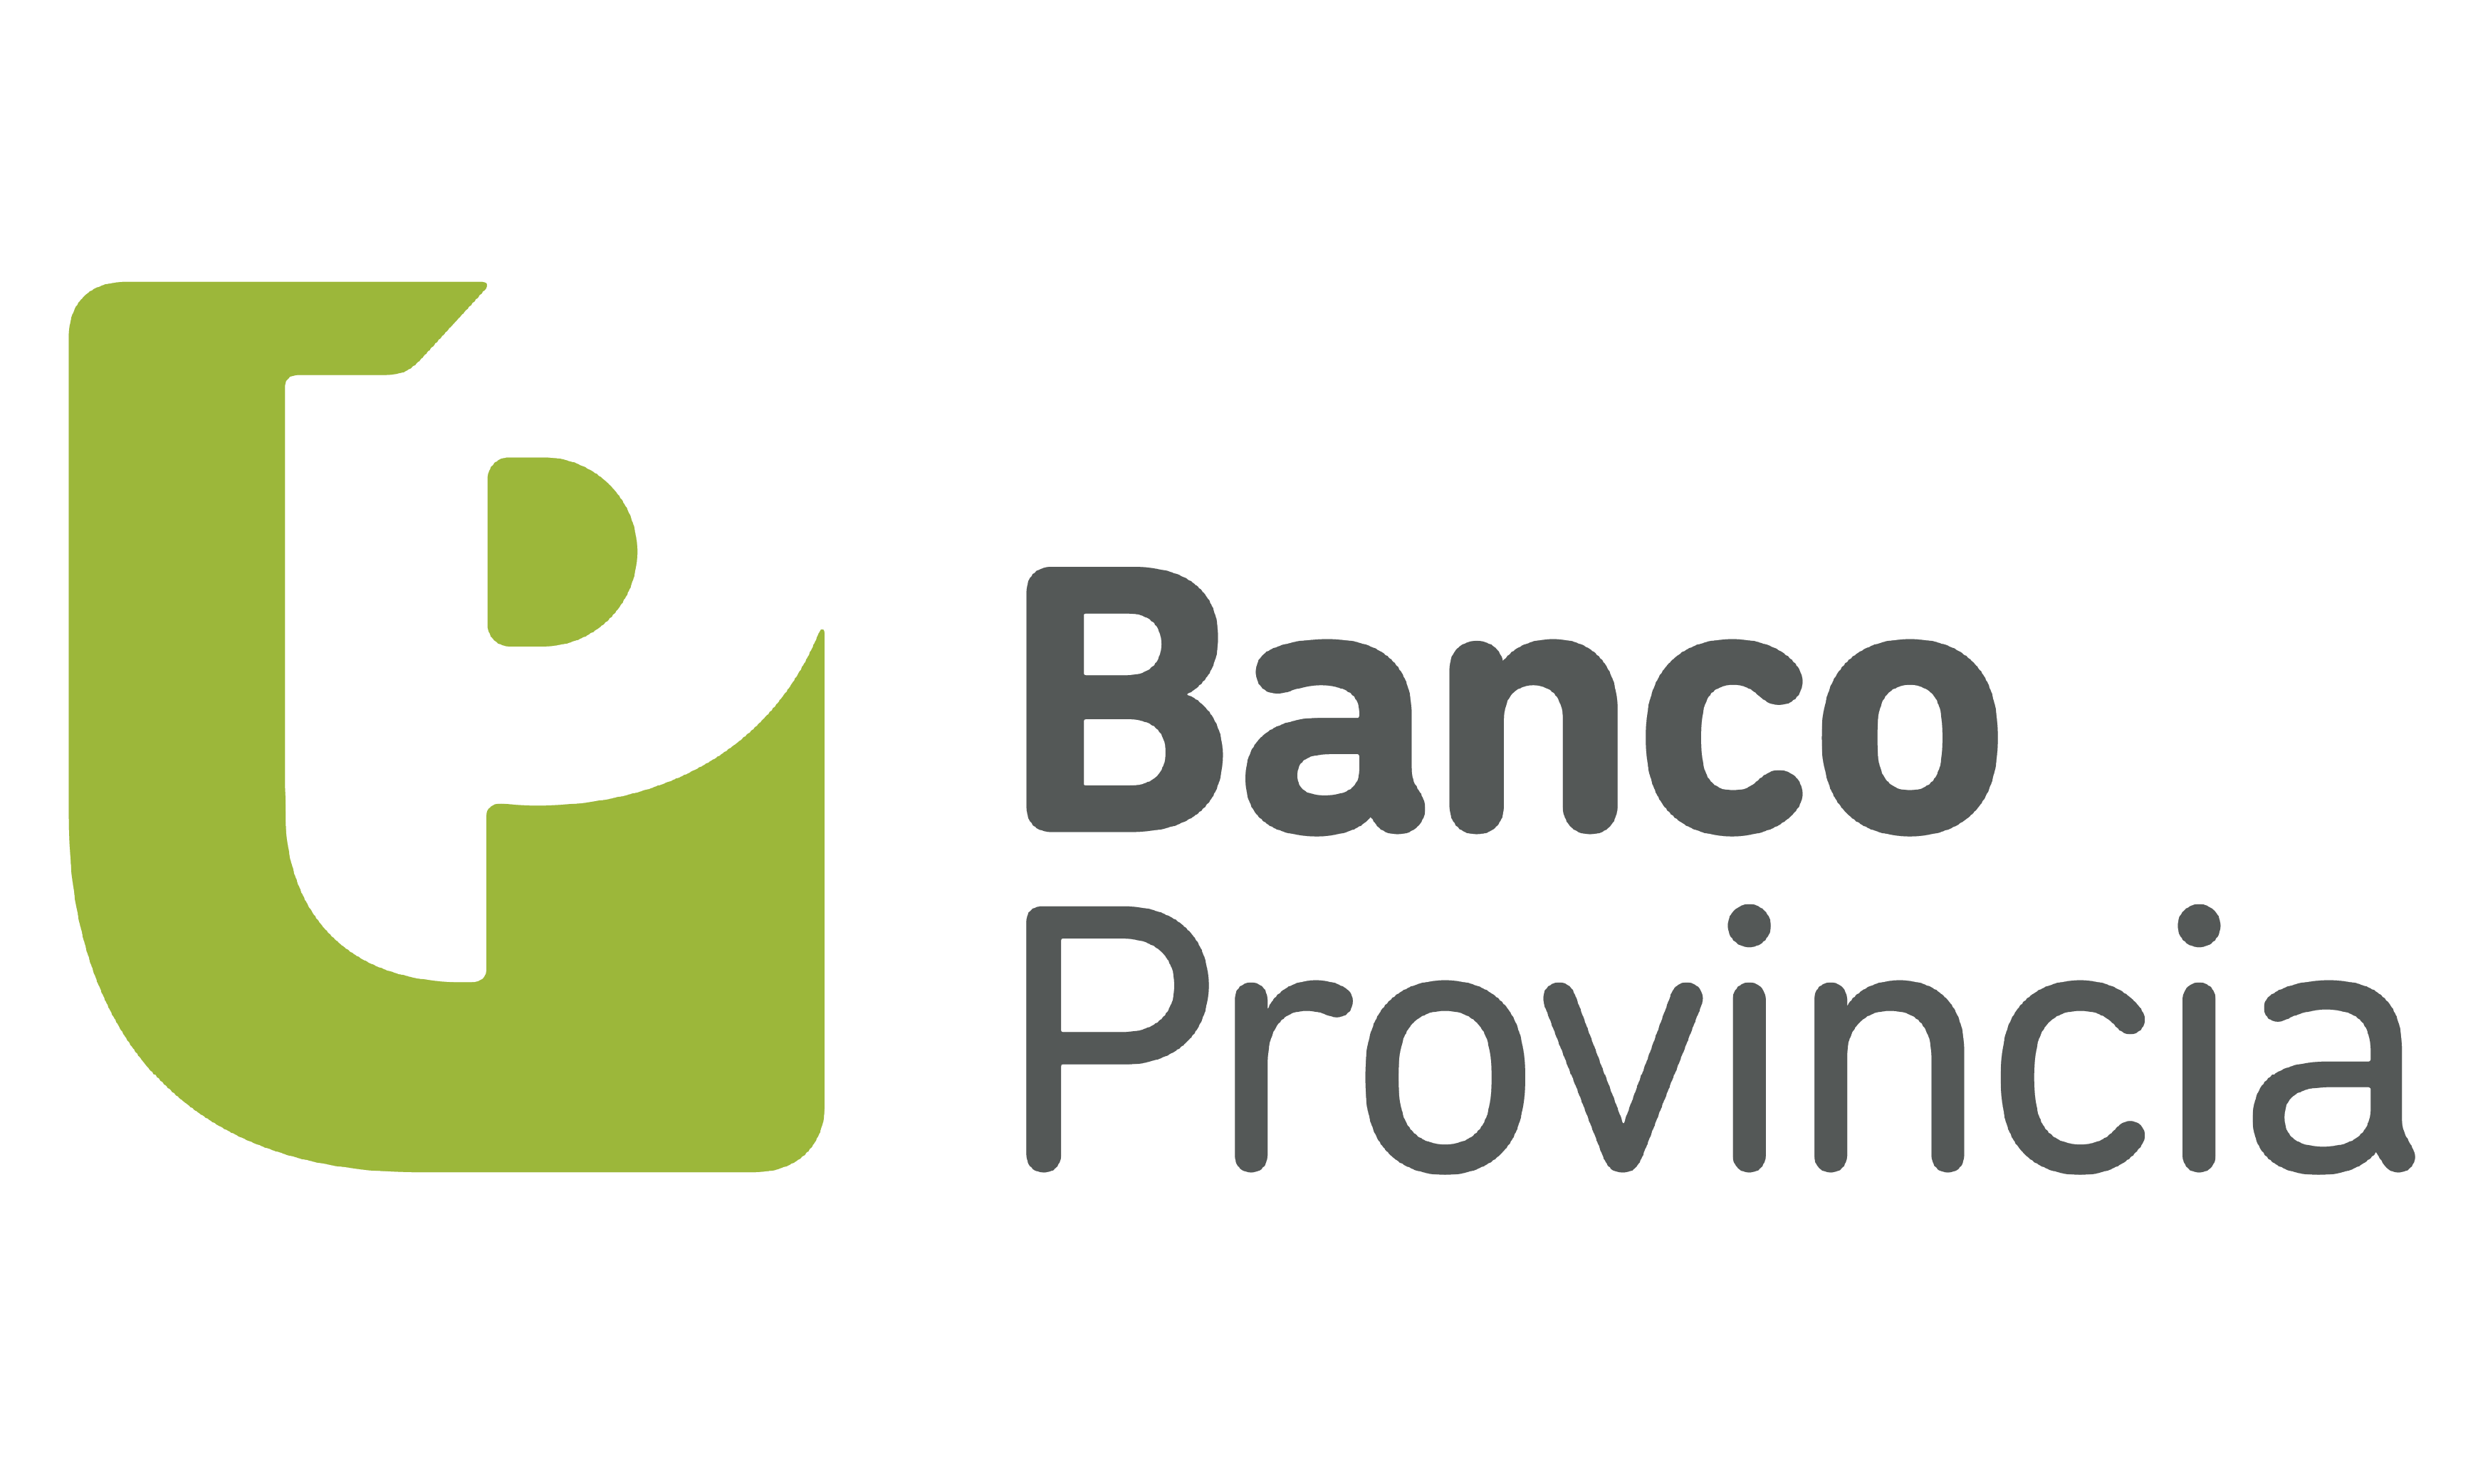 Banco Provincia logo